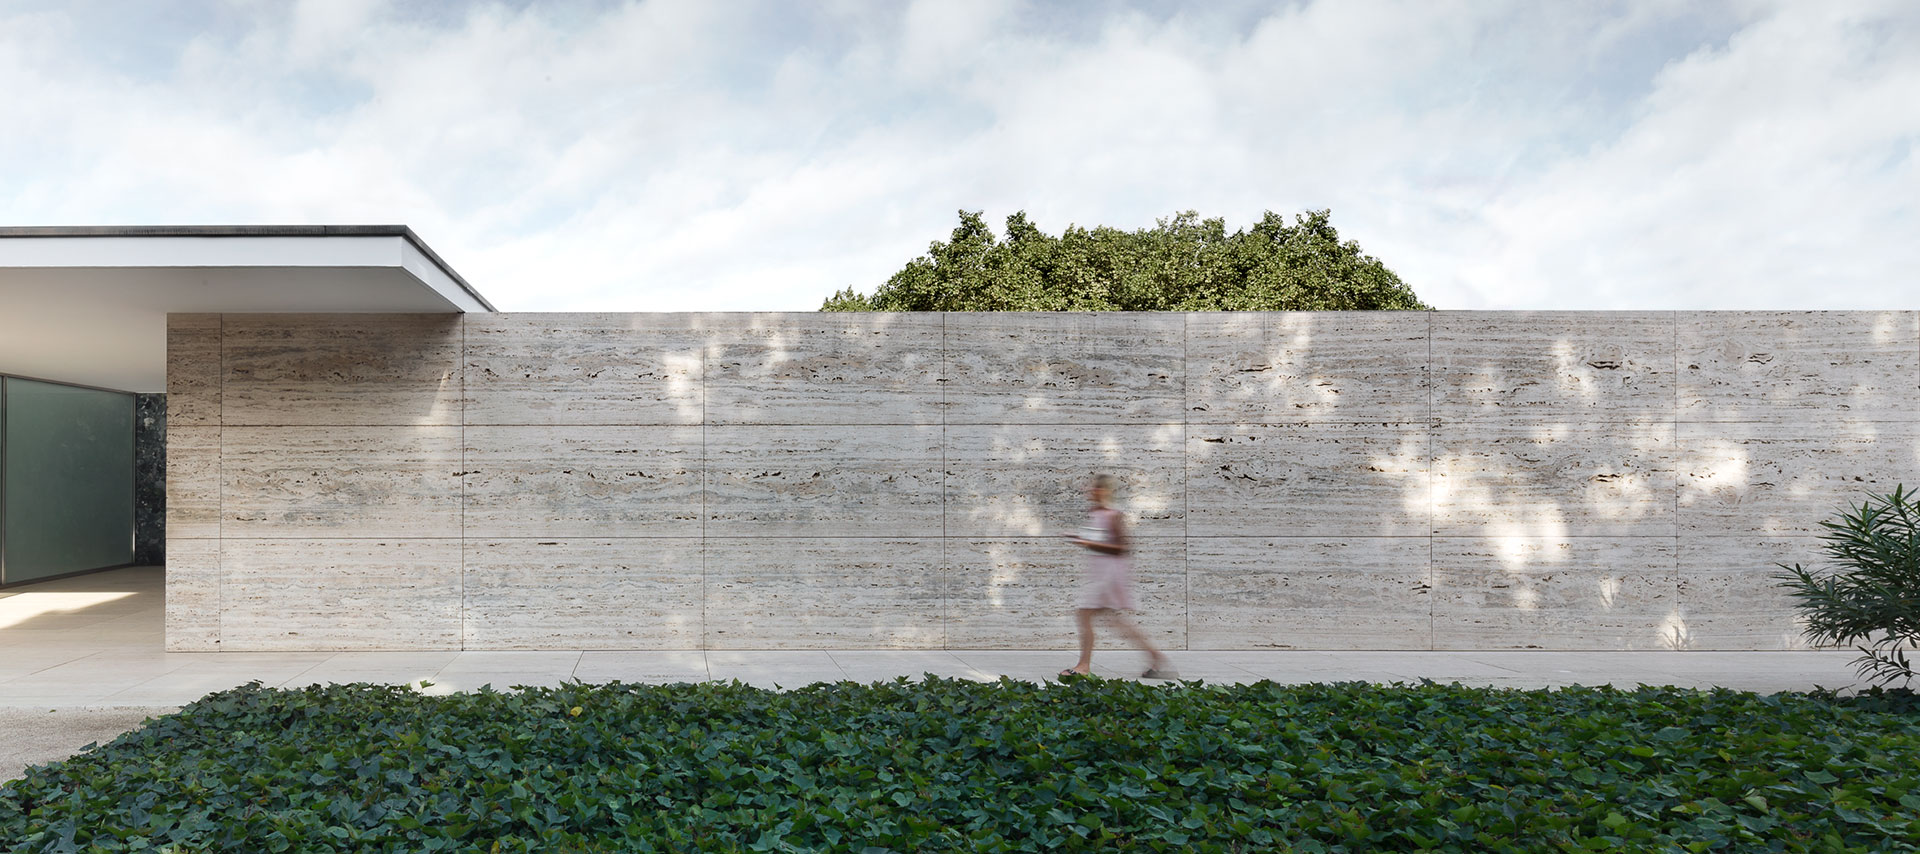 Mies van der Rohe Pavilion. Photograph © Rafa Vargas. Image courtesy of Fundació Mies van der Rohe